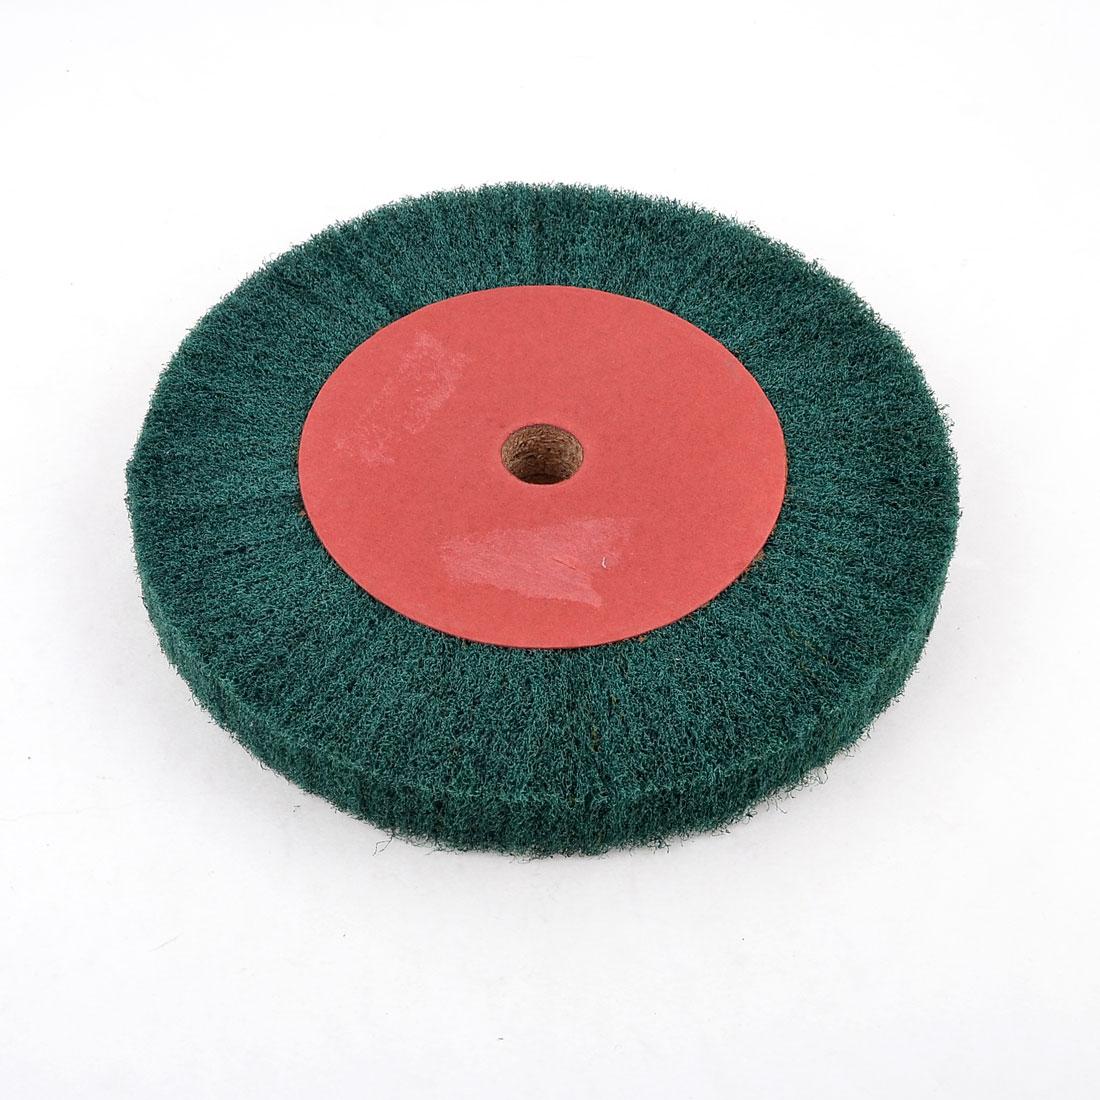 "8.1""x0.8""x1"" Green Nylon Wood Abrasives Slice Grinding Wheel"